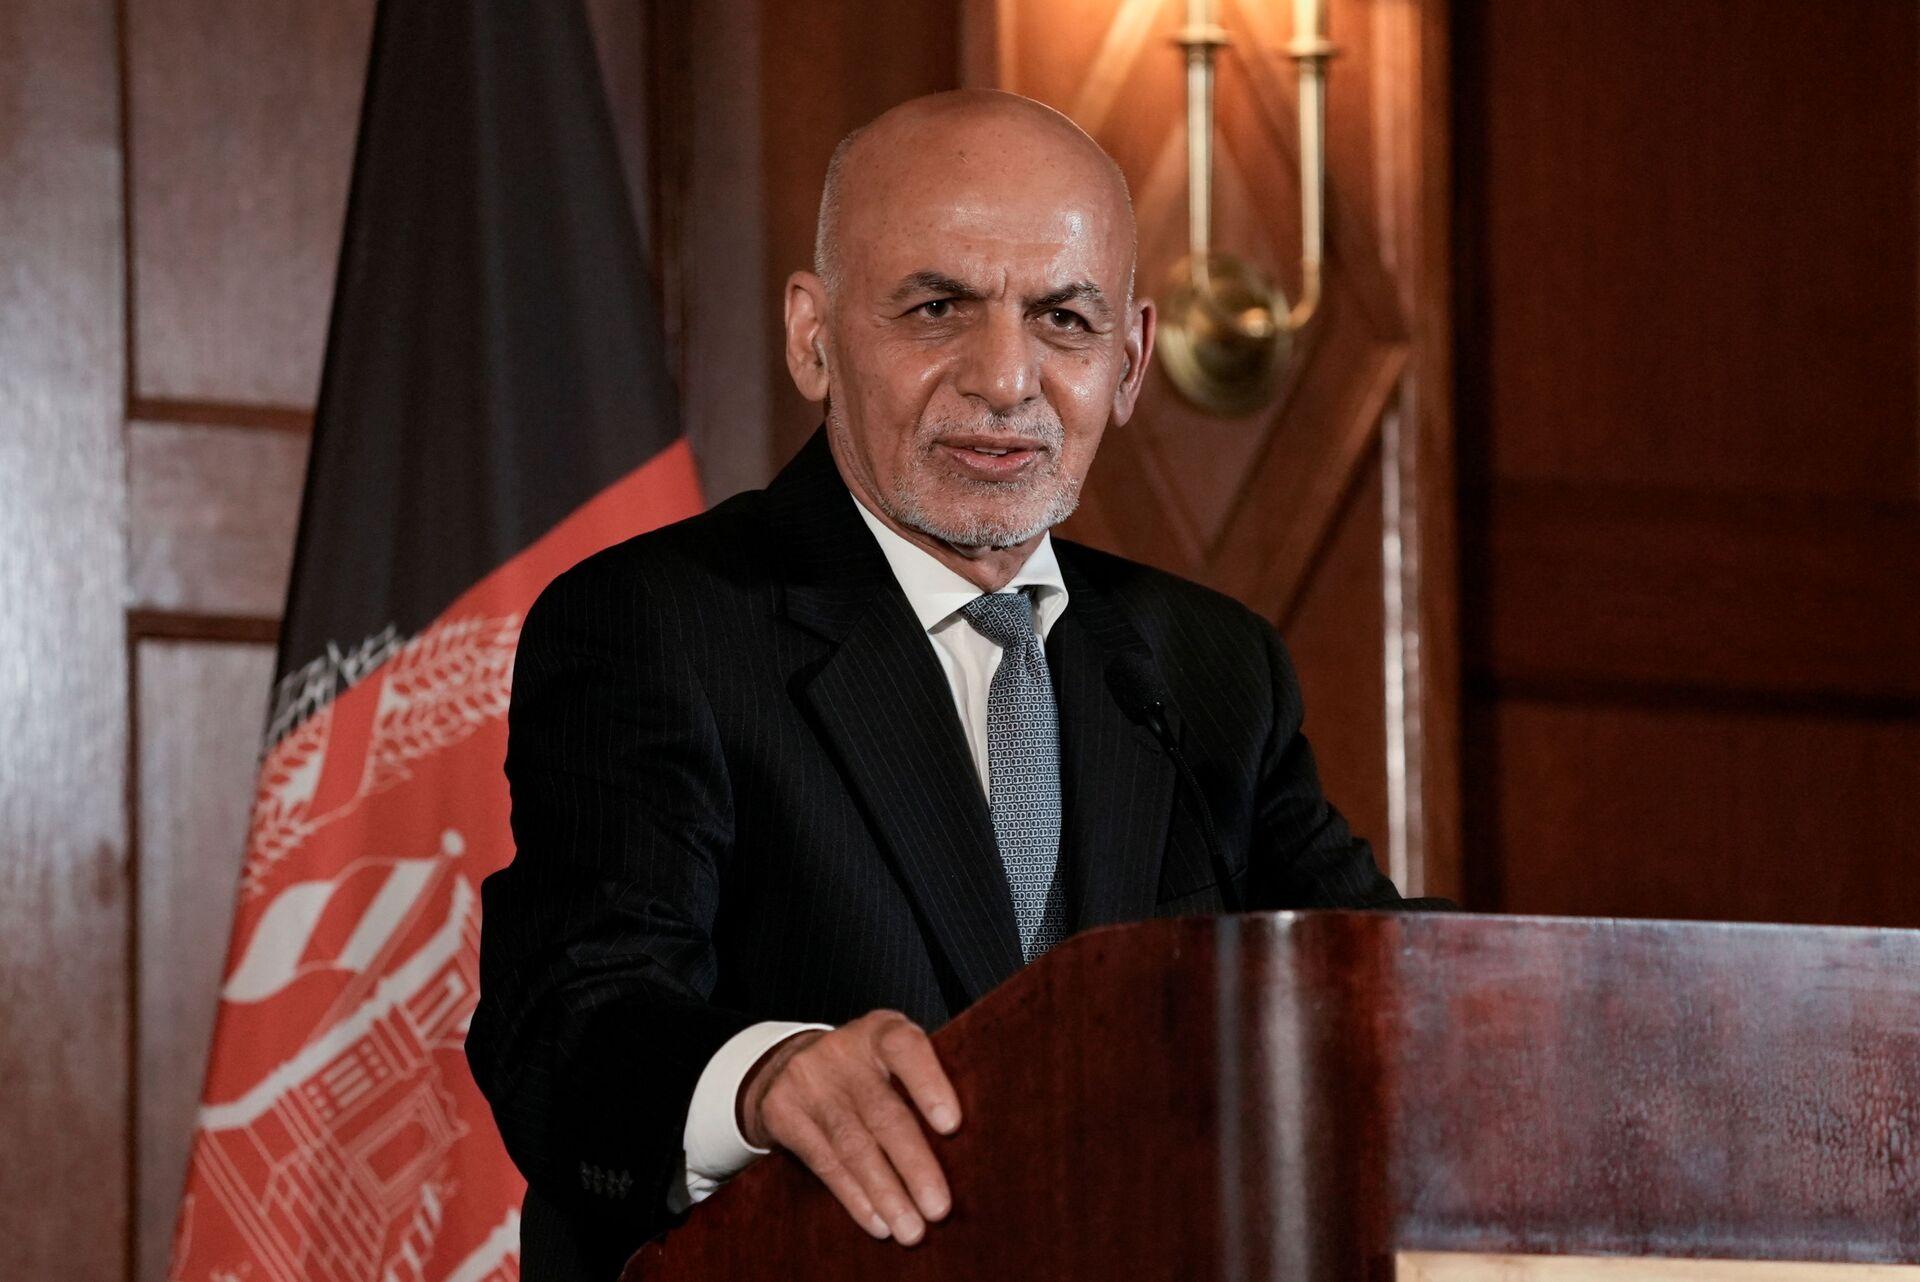 Afghanistan's President Ashraf Ghani speaks during a news conference following his meeting with U.S. President Joe Biden, at the Willard Hotel in Washington, D.C., U.S., June 25, 2021 - Sputnik International, 1920, 07.09.2021